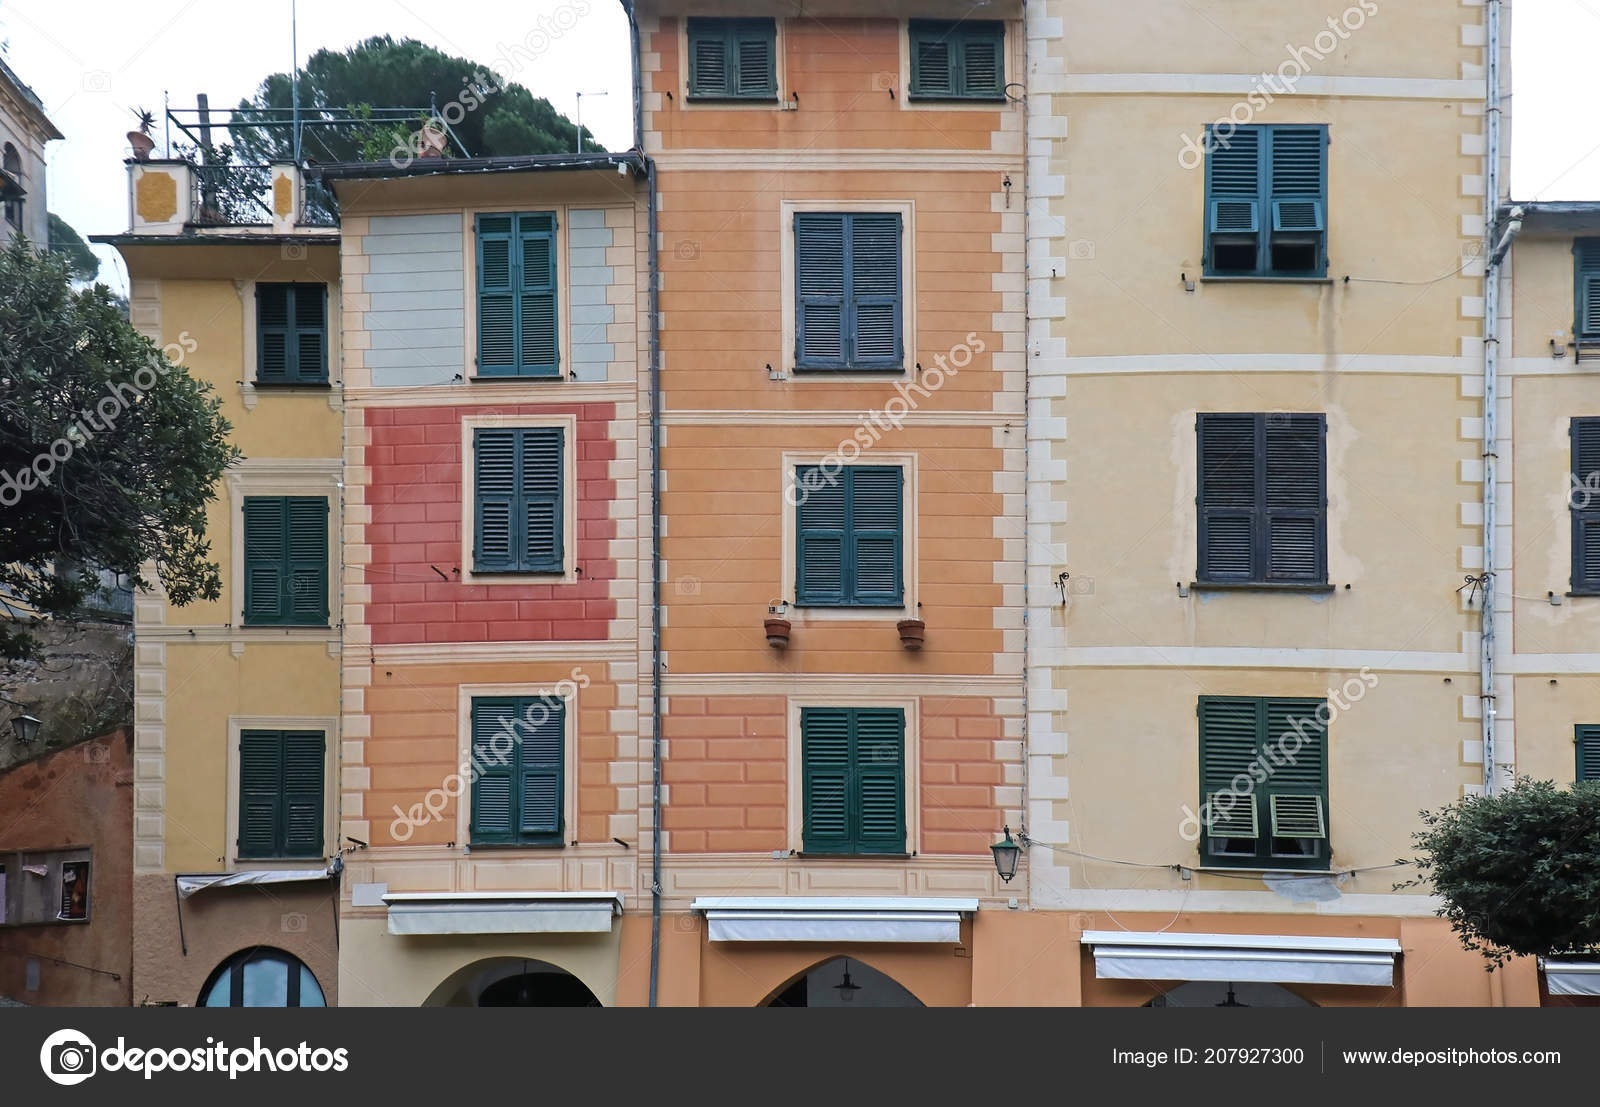 Retro Houses Exterior Colorful Facades Closed Windows — Stock Photo